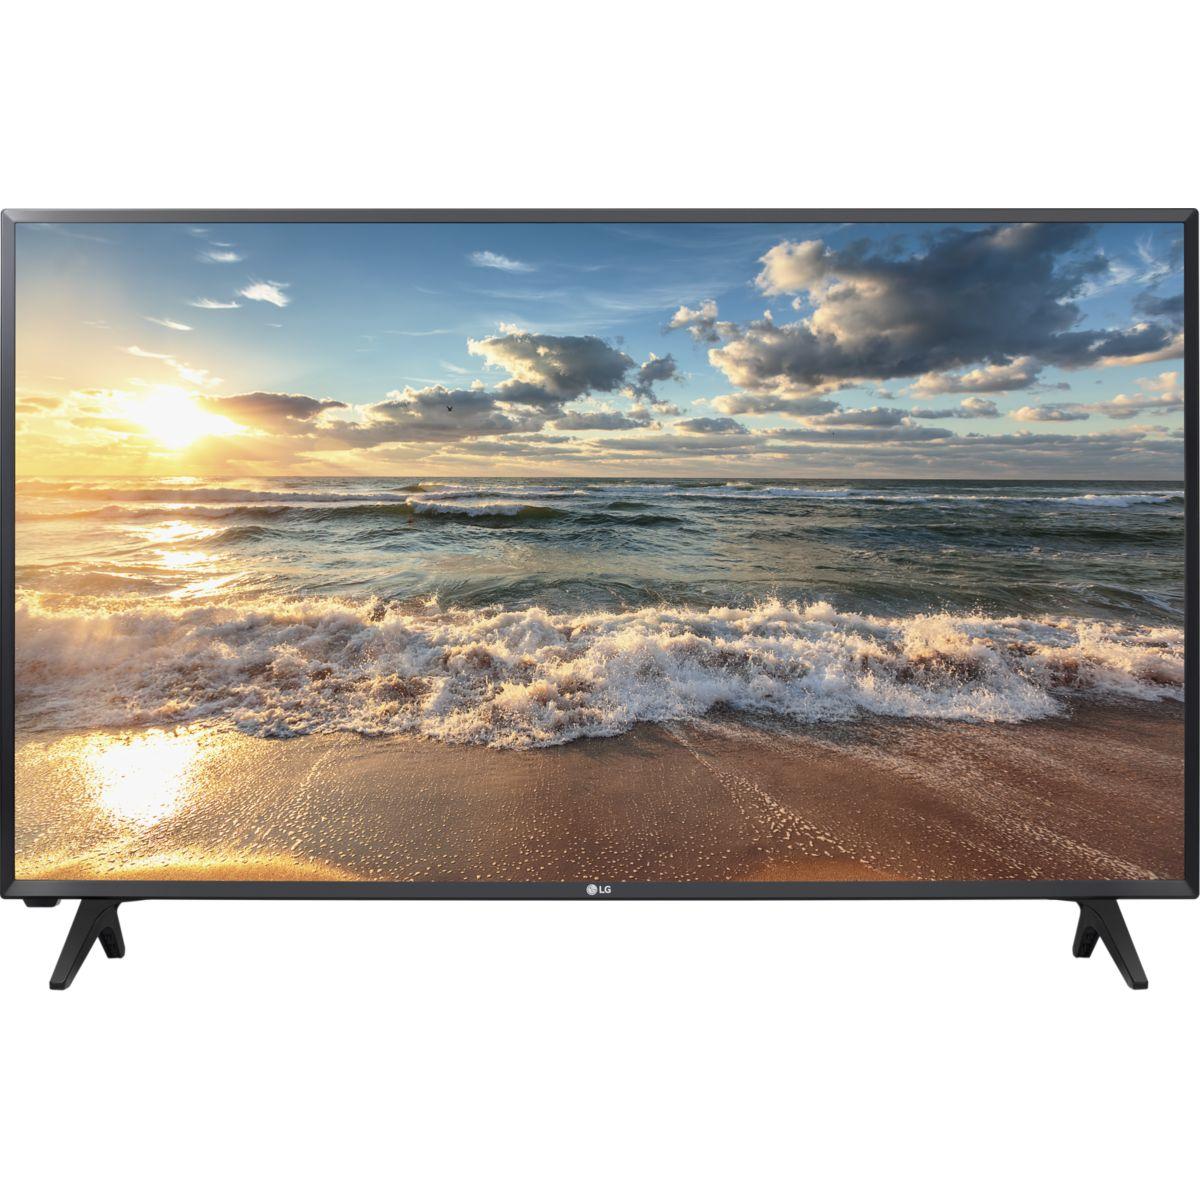 TV LED LG 43LJ500V